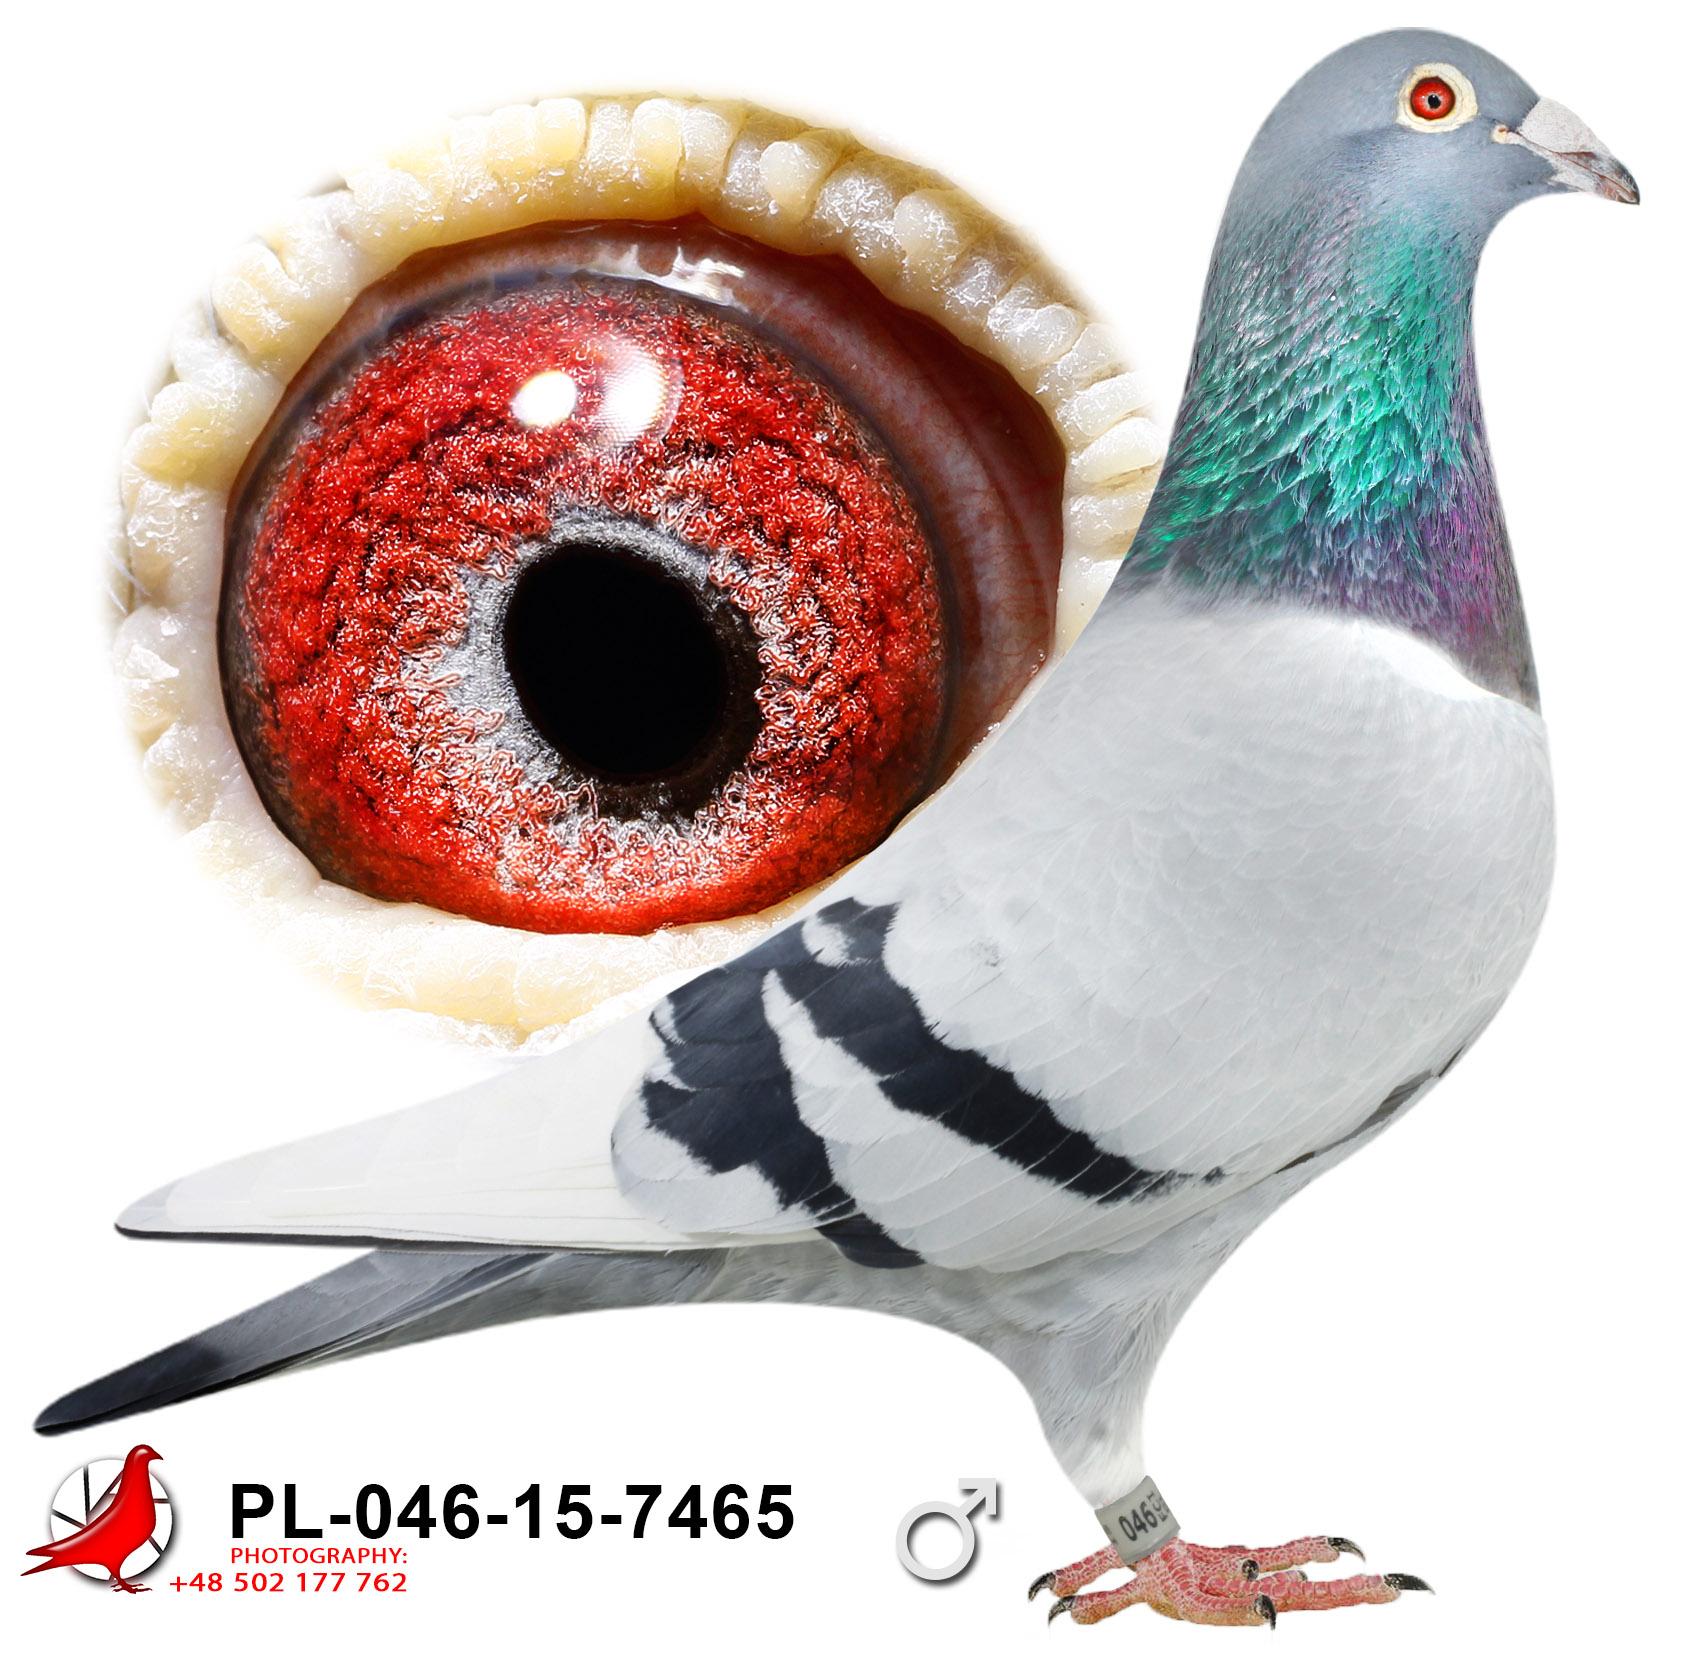 pl-046-15-7465_c (1)